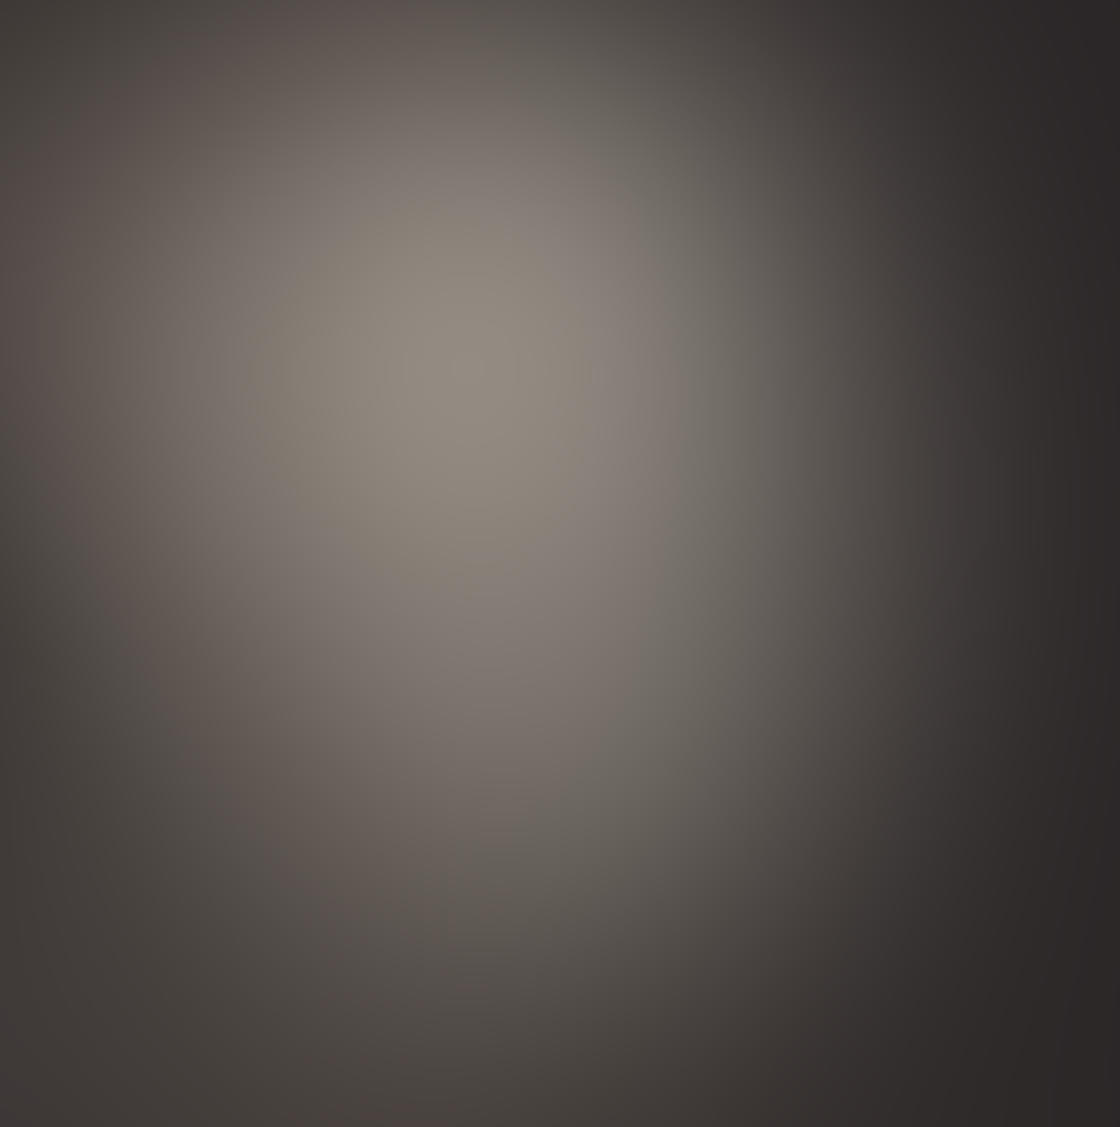 Vsco filters 19